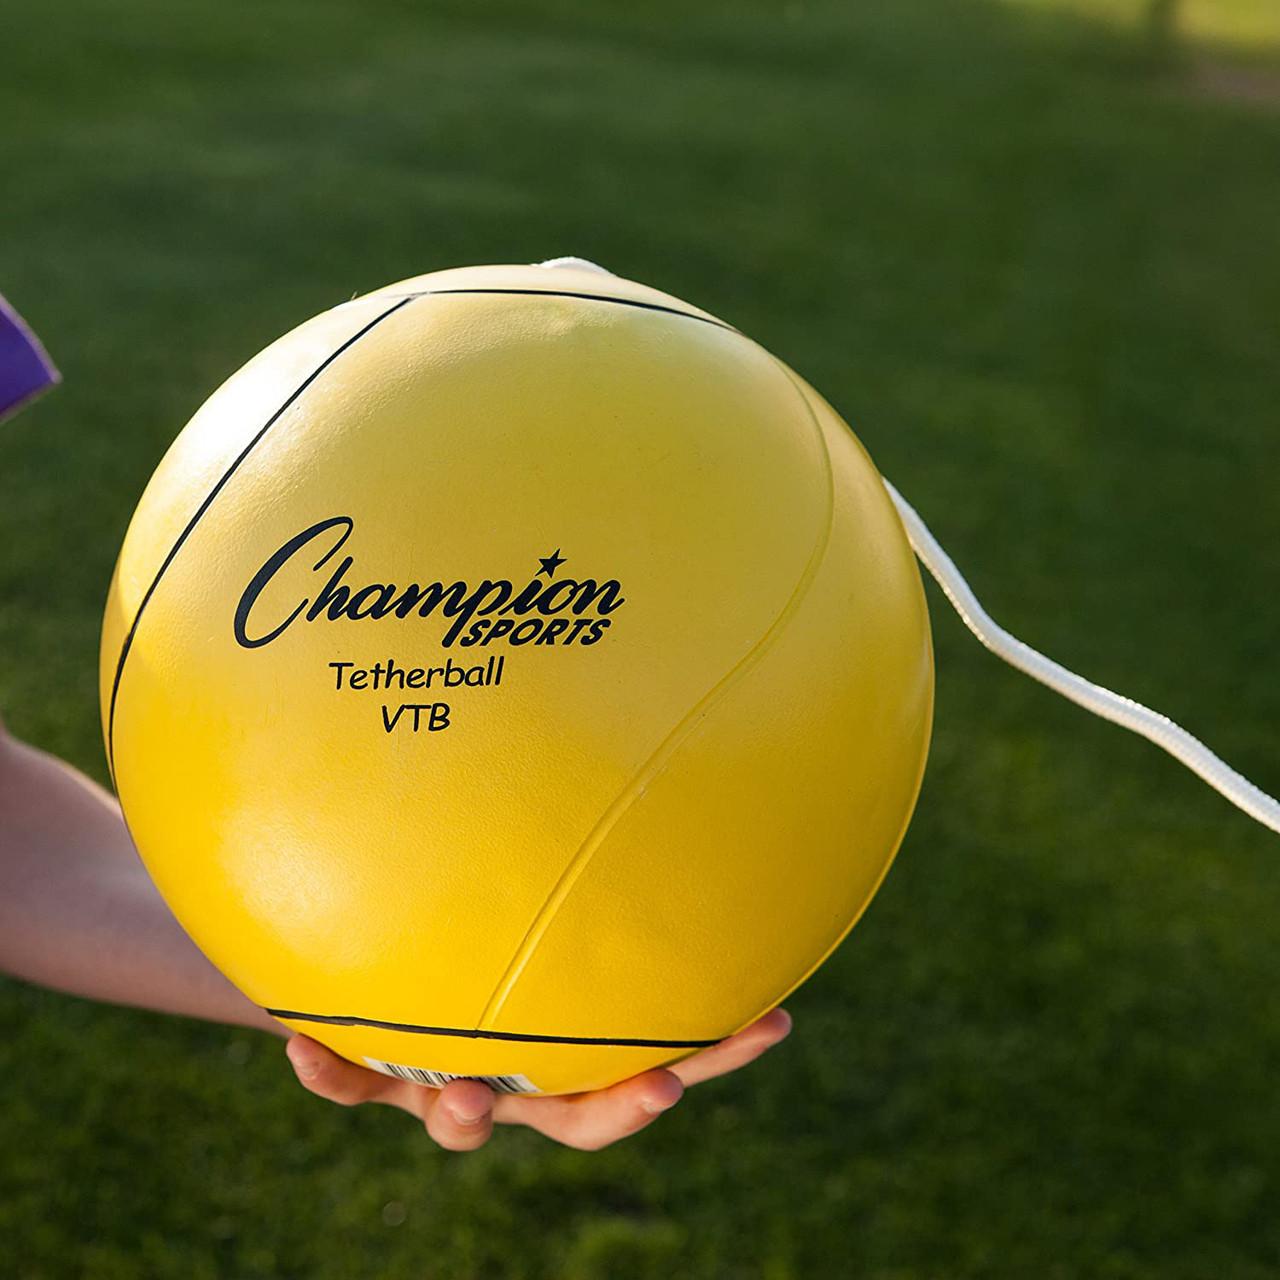 Champions Series Tetherball Set